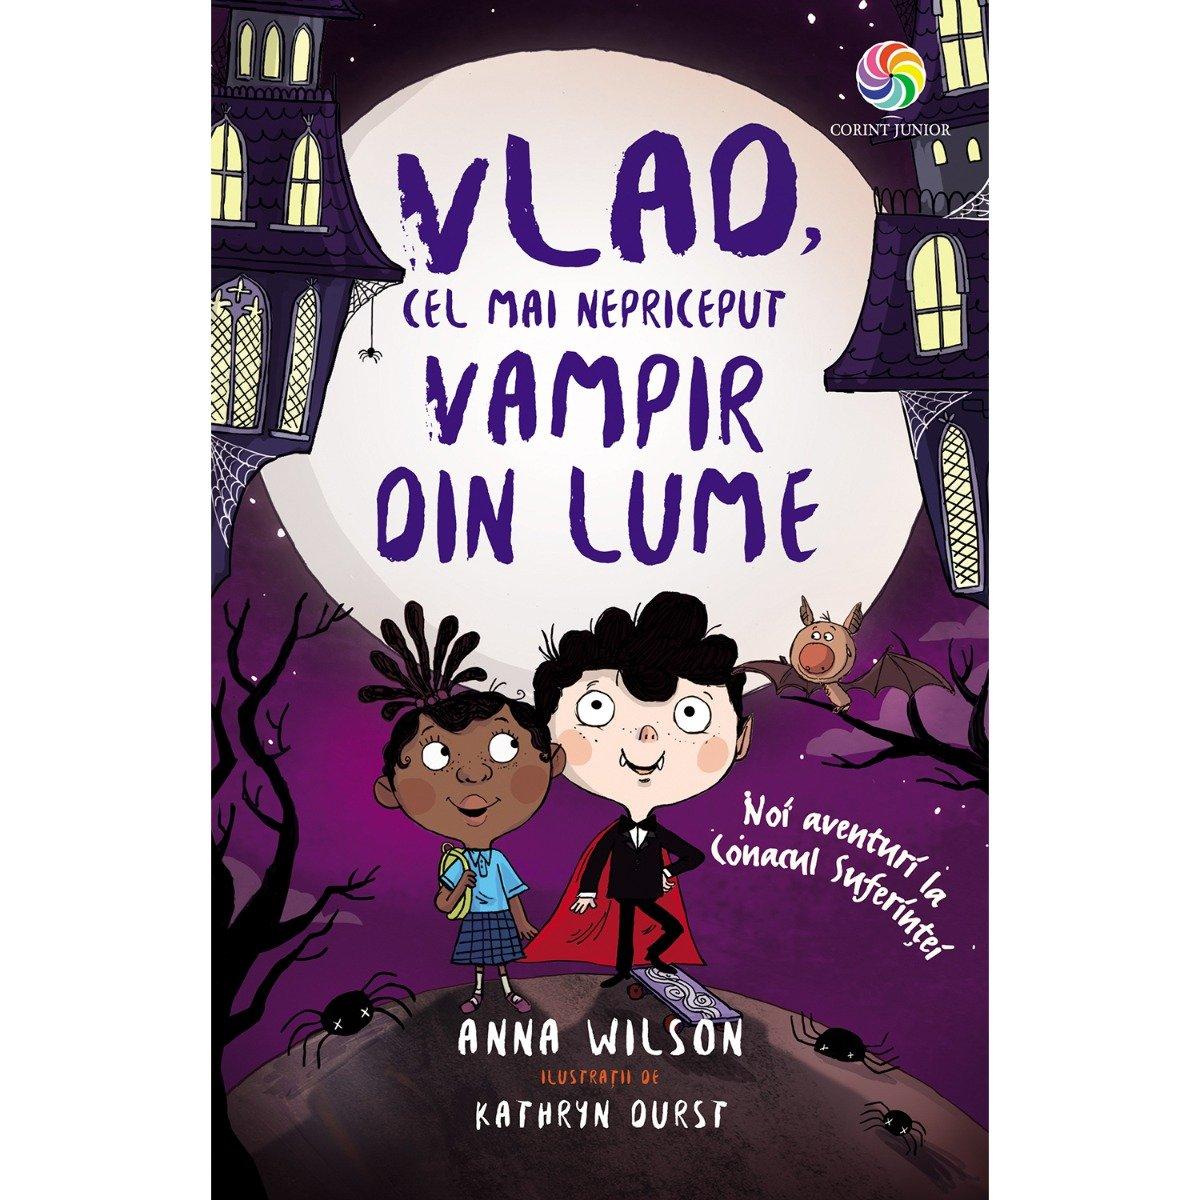 Carte Editura Corint, Vlad, cel mai nepriceput vampir vol.II Noi aventuri la conacul suferintei, Anna Wilson